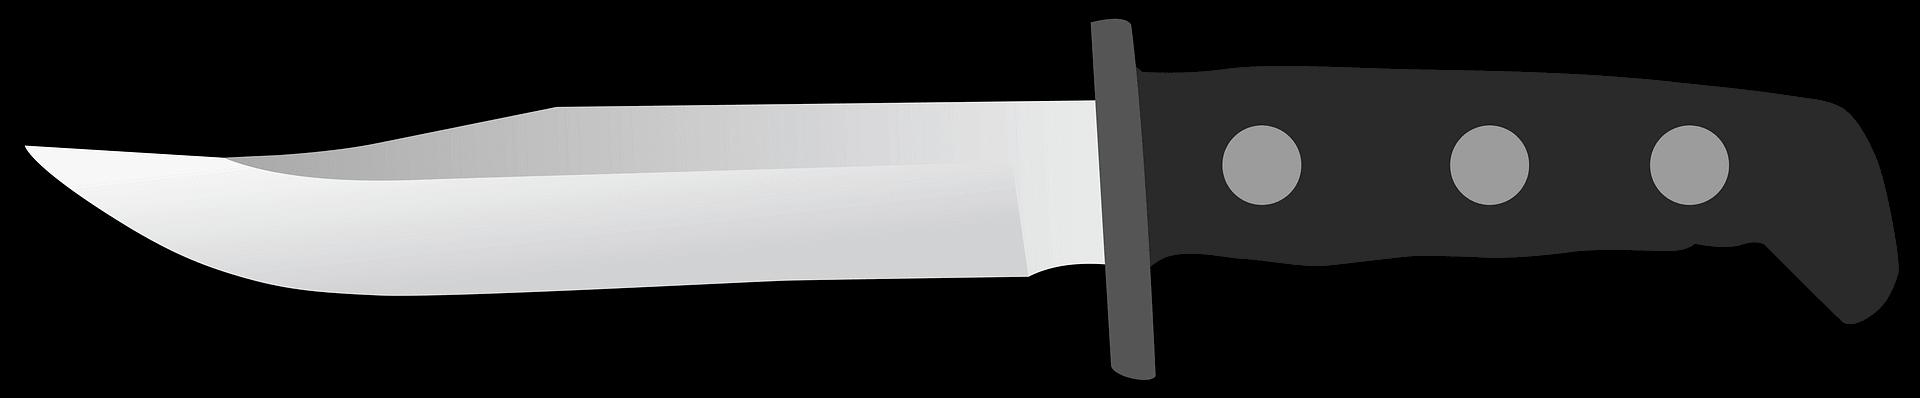 Knife clipart transparent background